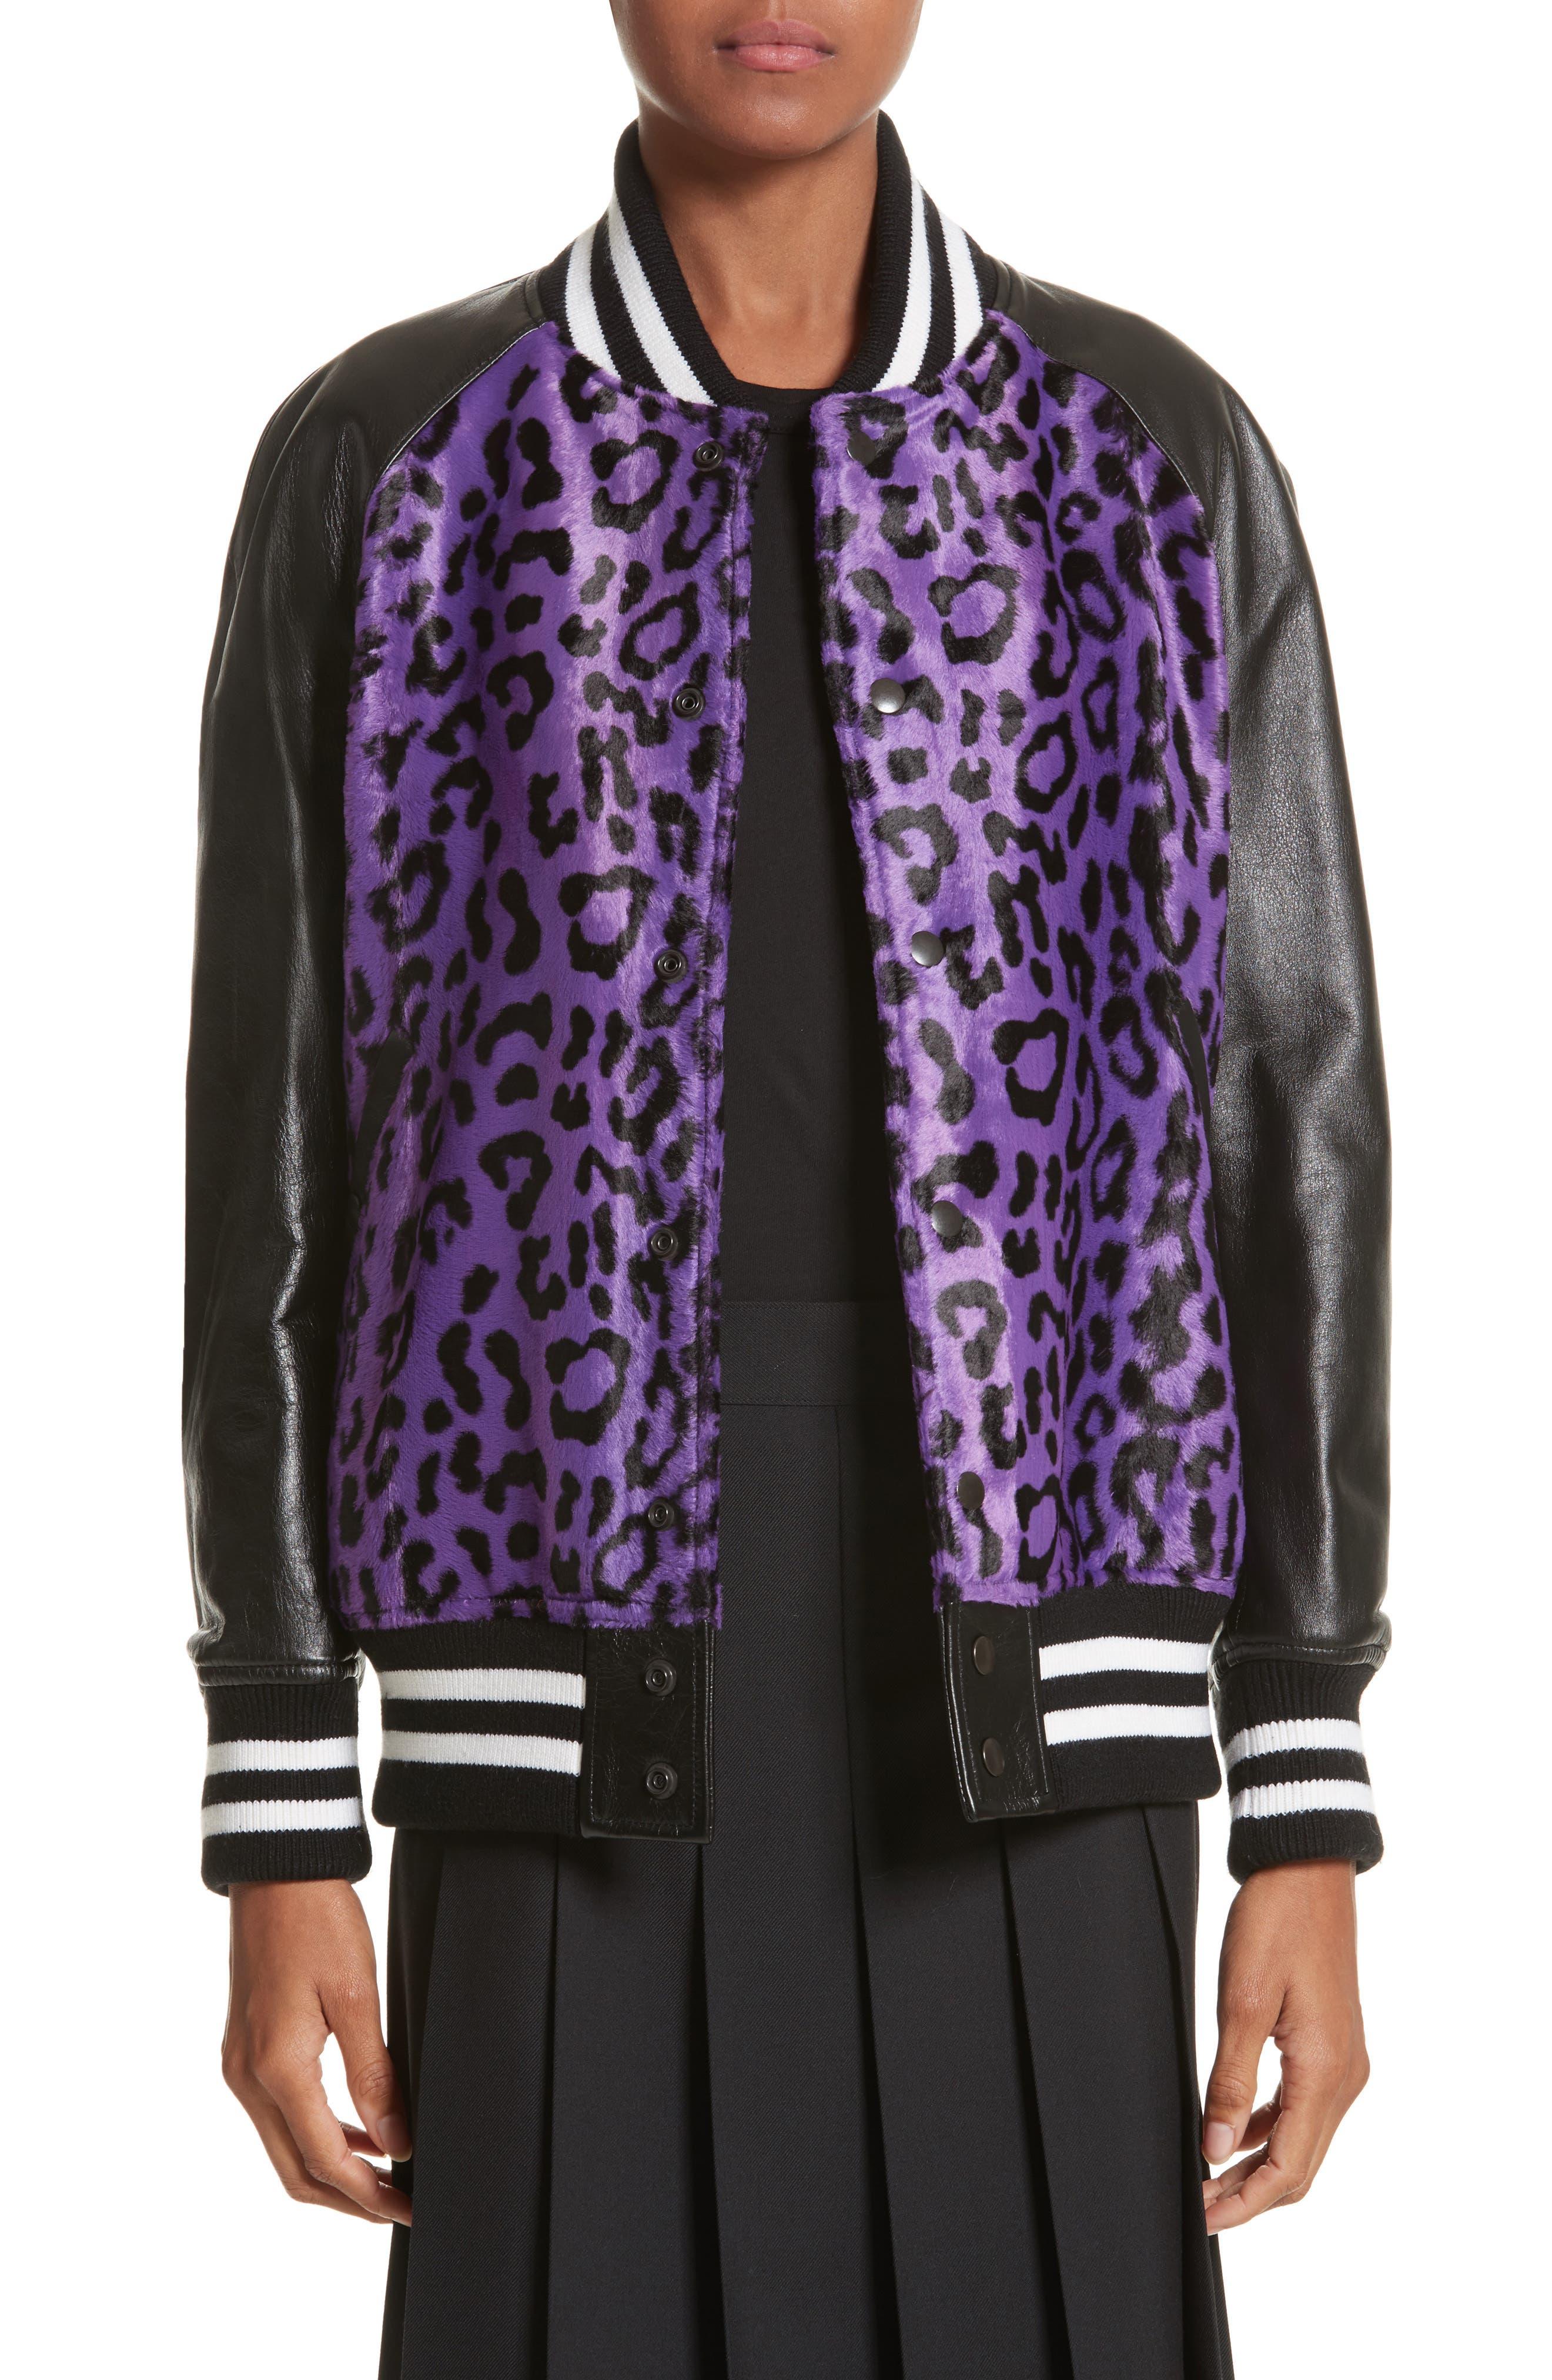 Cheetah Print Faux Fur & Leather Track Jacket,                             Main thumbnail 1, color,                             540